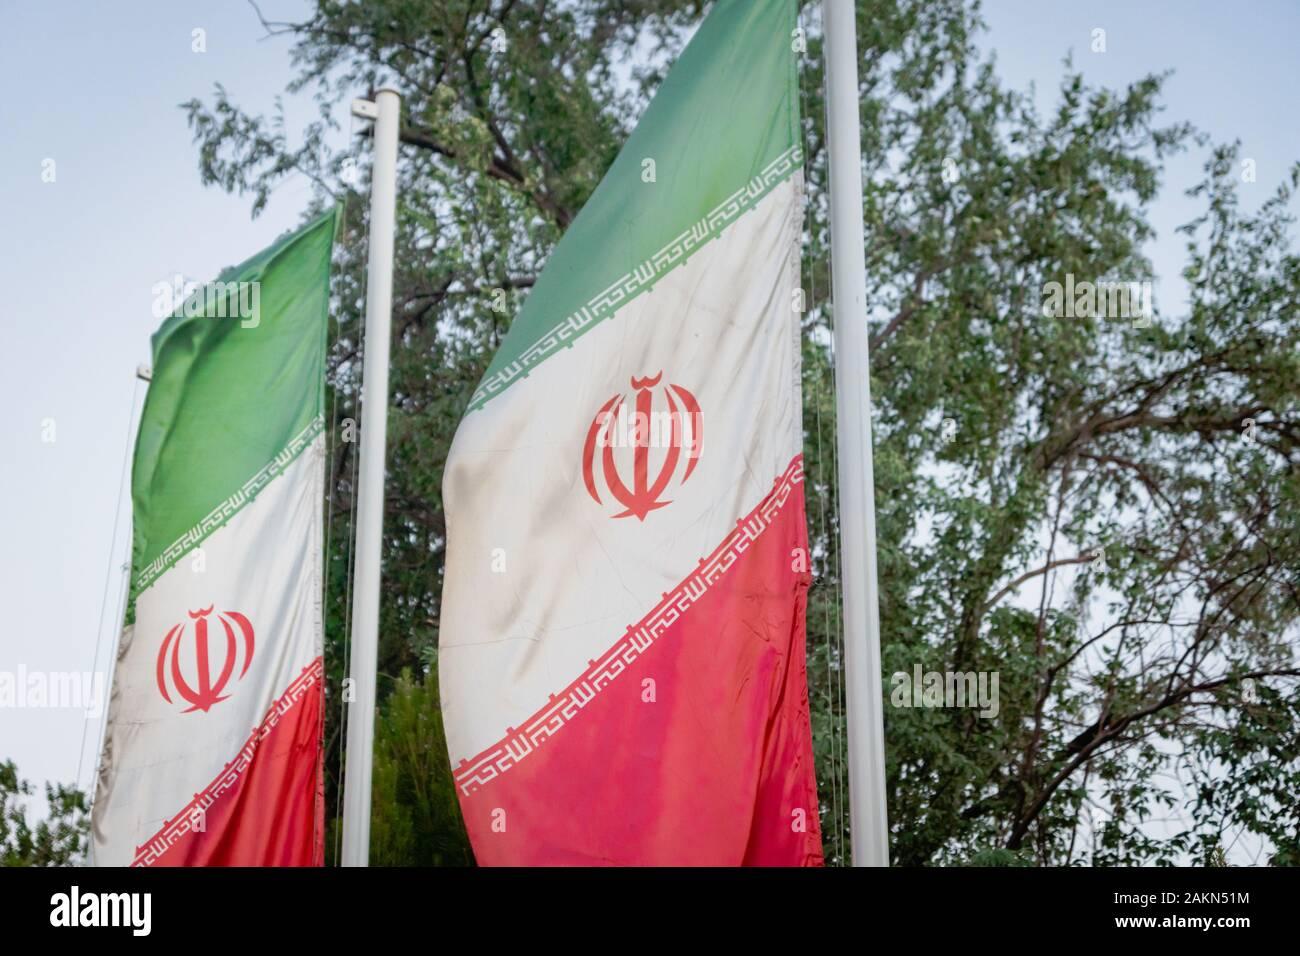 Iranian flags, flags of Islamic Republic of Iran, waving against blue sky Stock Photo